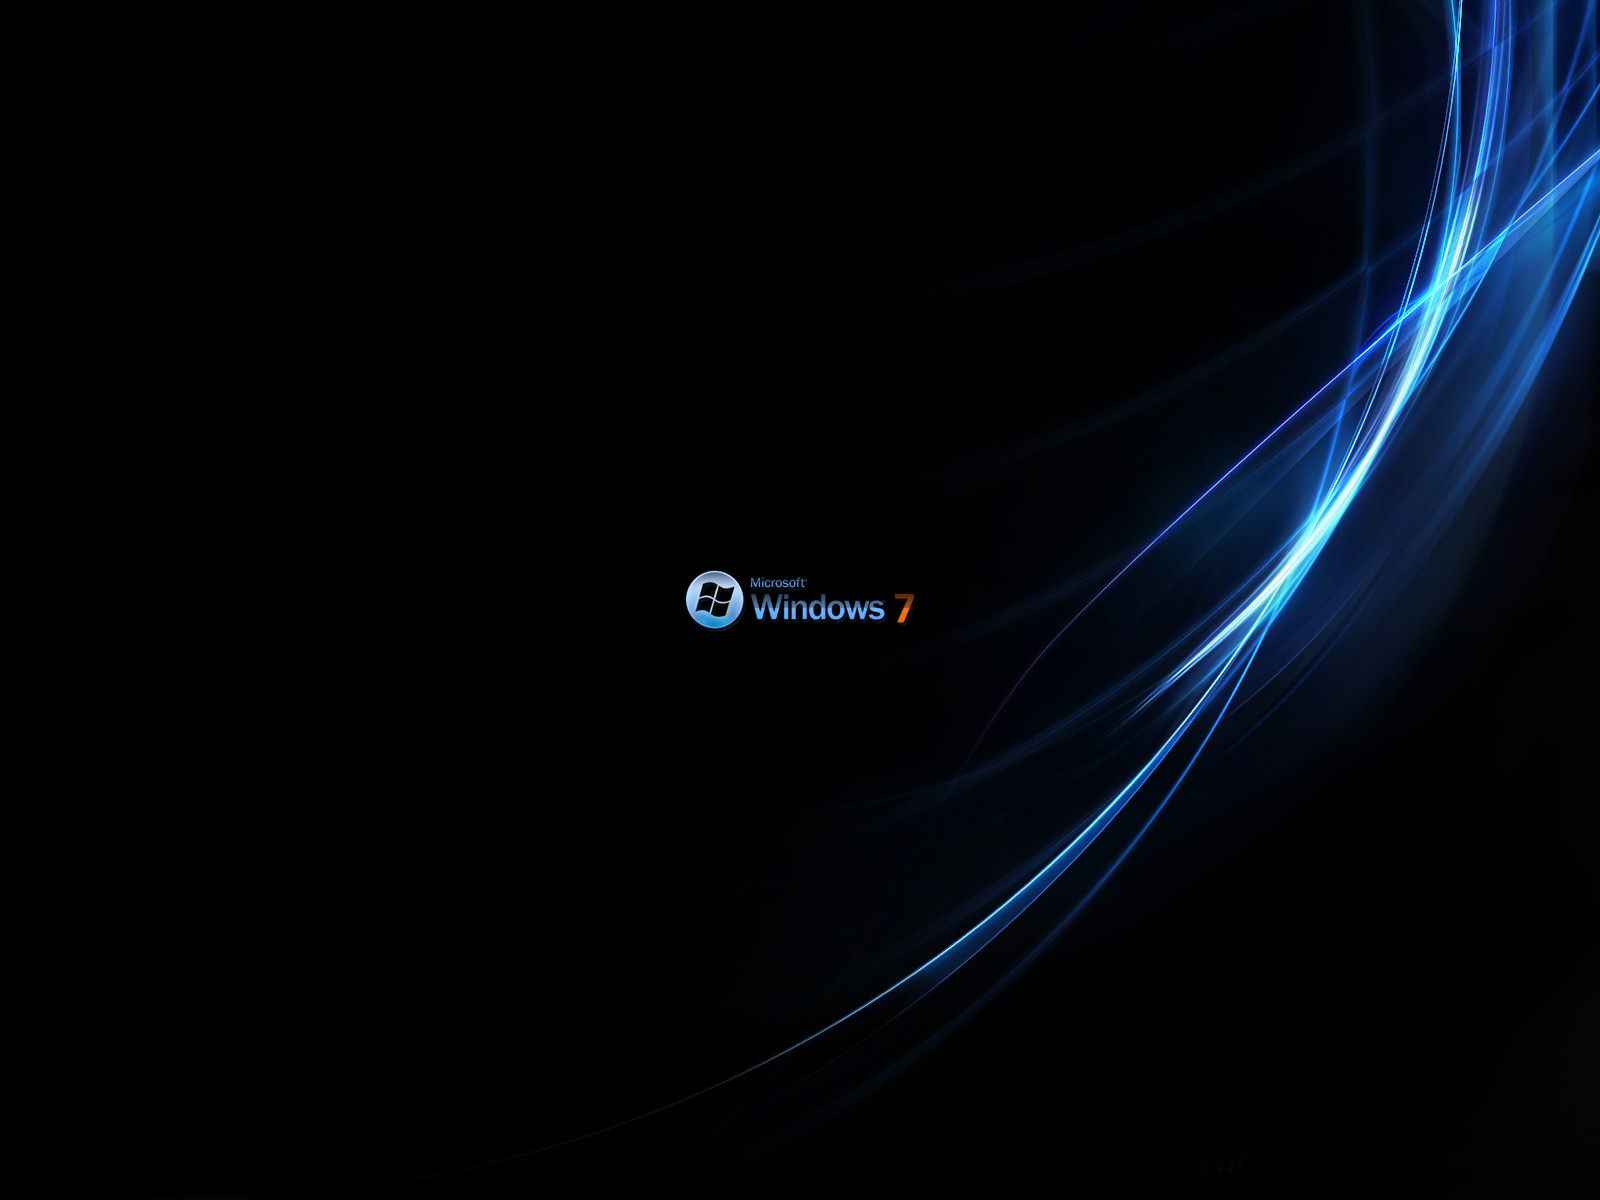 Download windows seven black 1024x768 wallpaper 1771 - Black Wallpapers For Windows Windows Images Windows Pictures Free